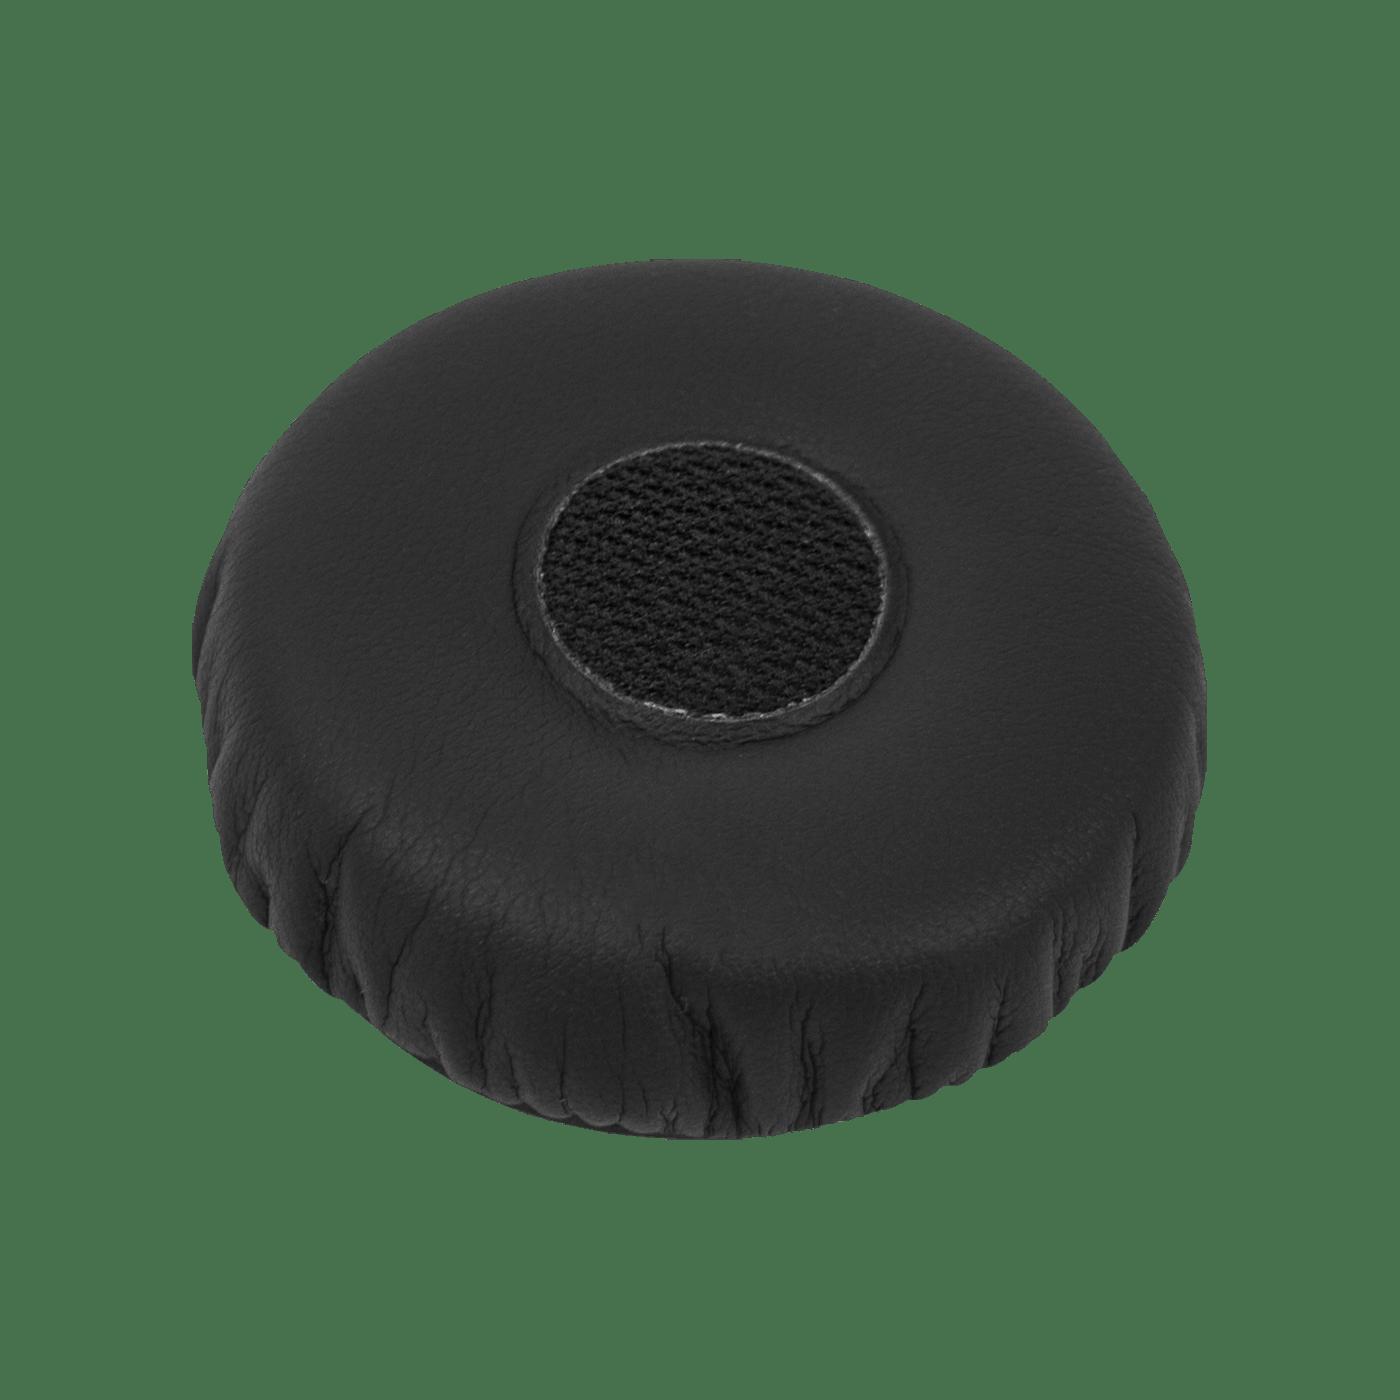 Jabra UC Voice 750 Ear Cushions